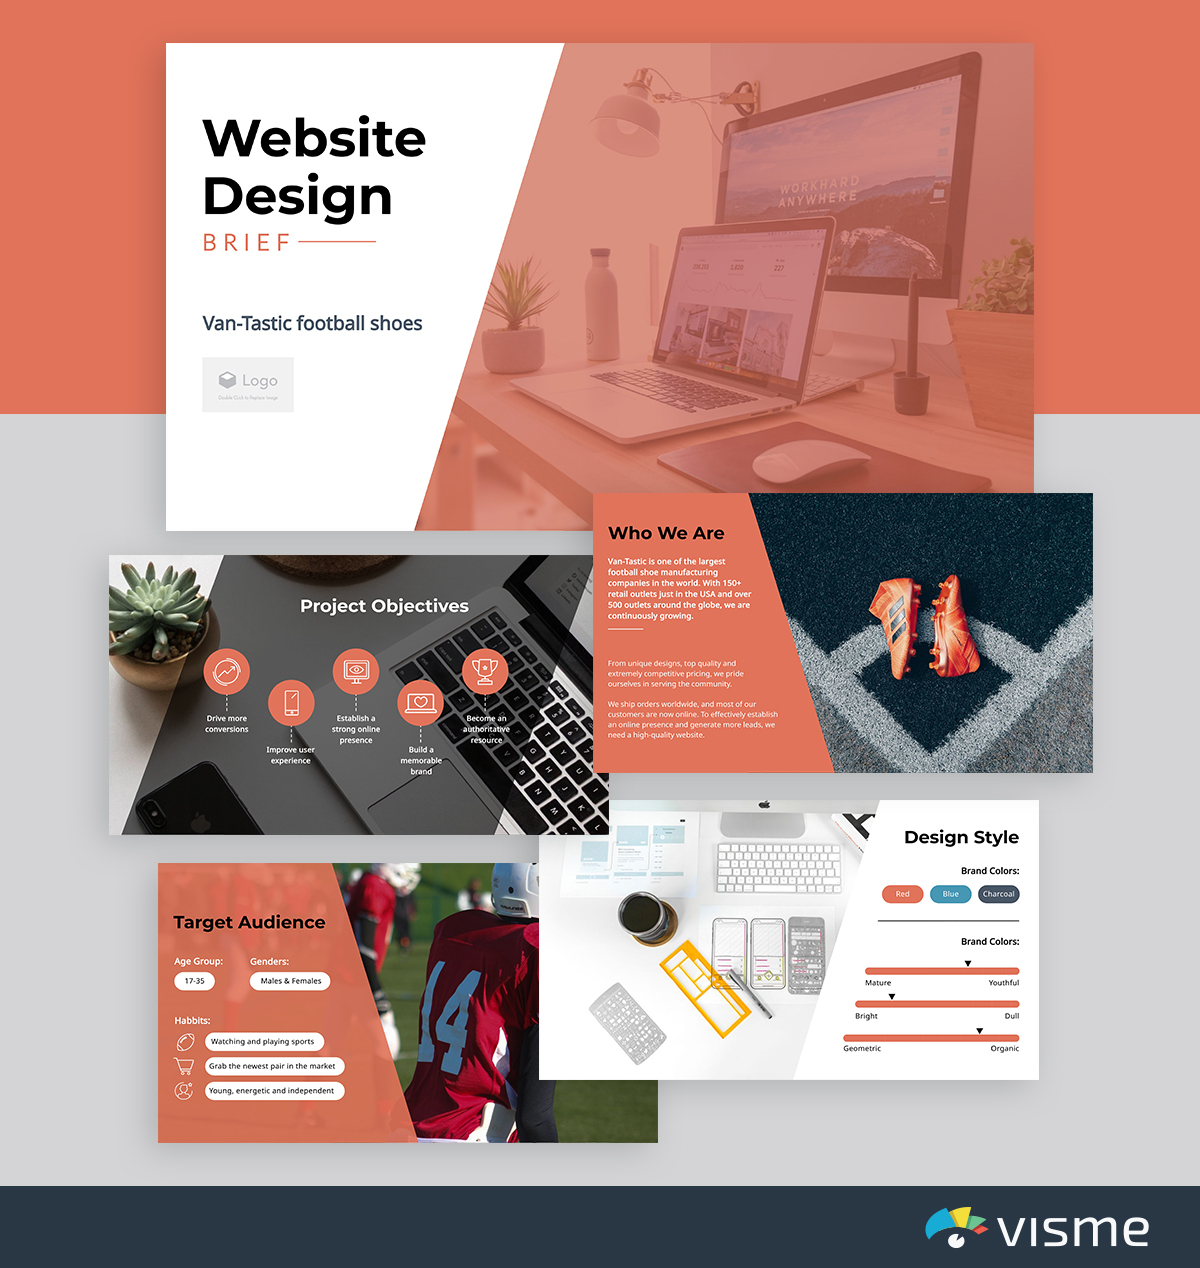 design brief - presentation design brief template